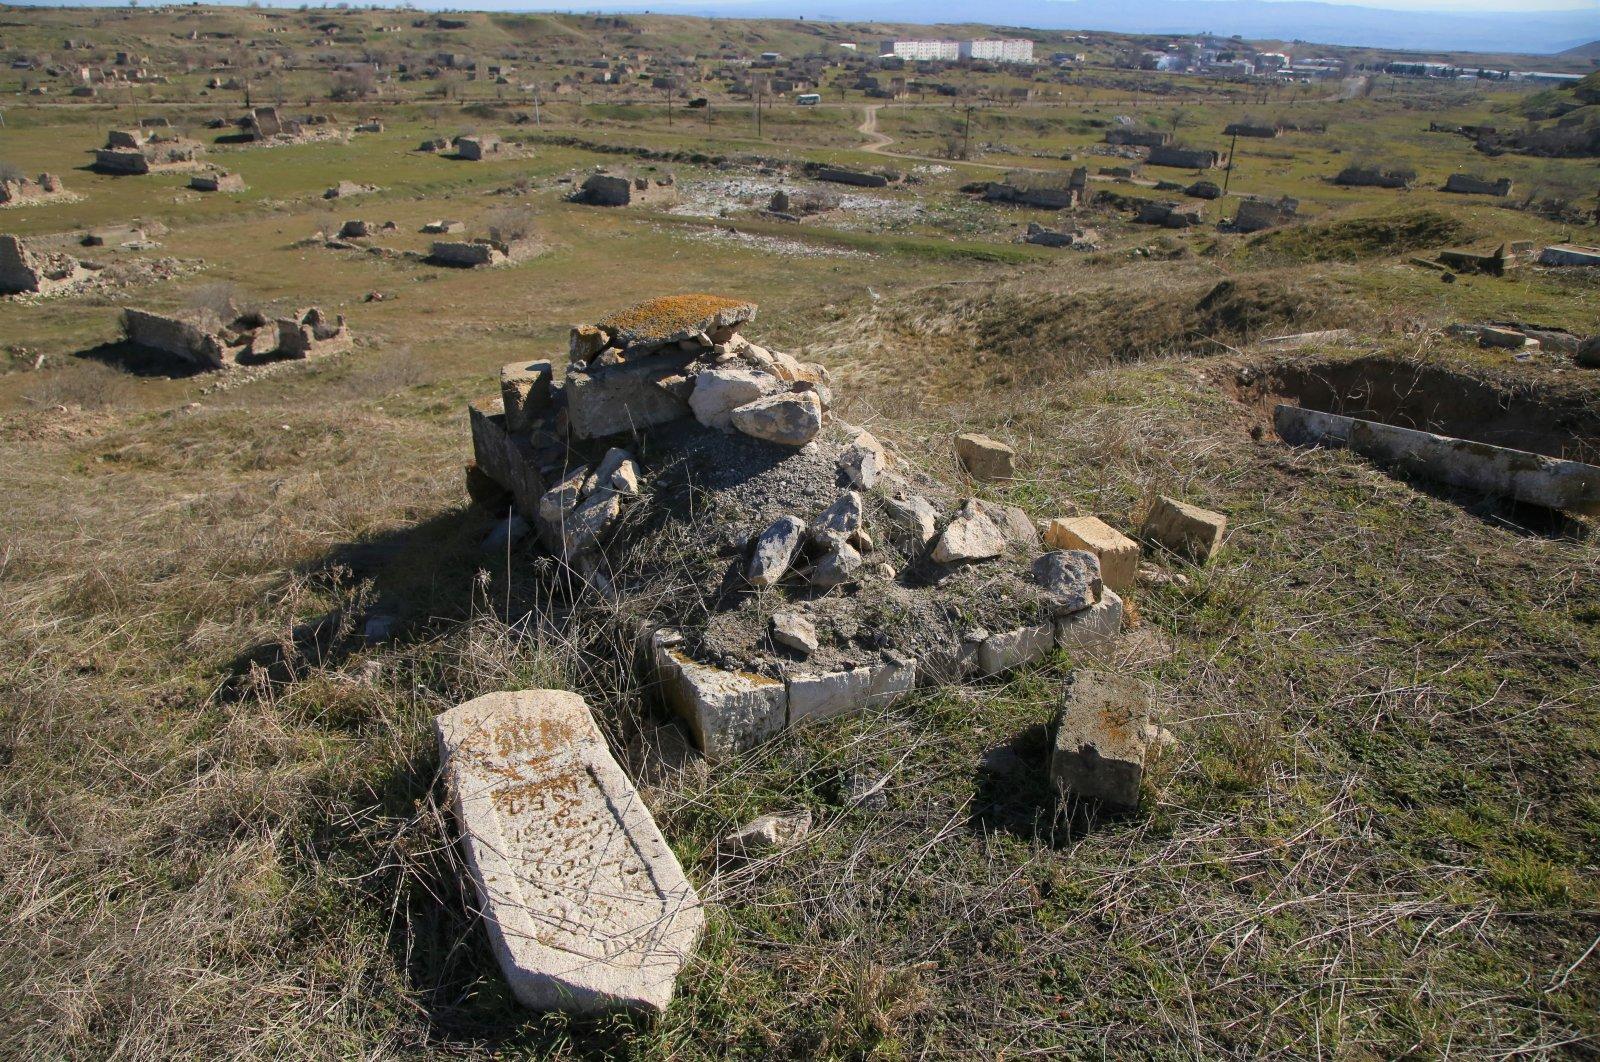 The scene of damaged graveyards in Jabrayil cemetery in Nagorno-Karabakh, Azerbaijan, Feb.23, 2021. (AA)